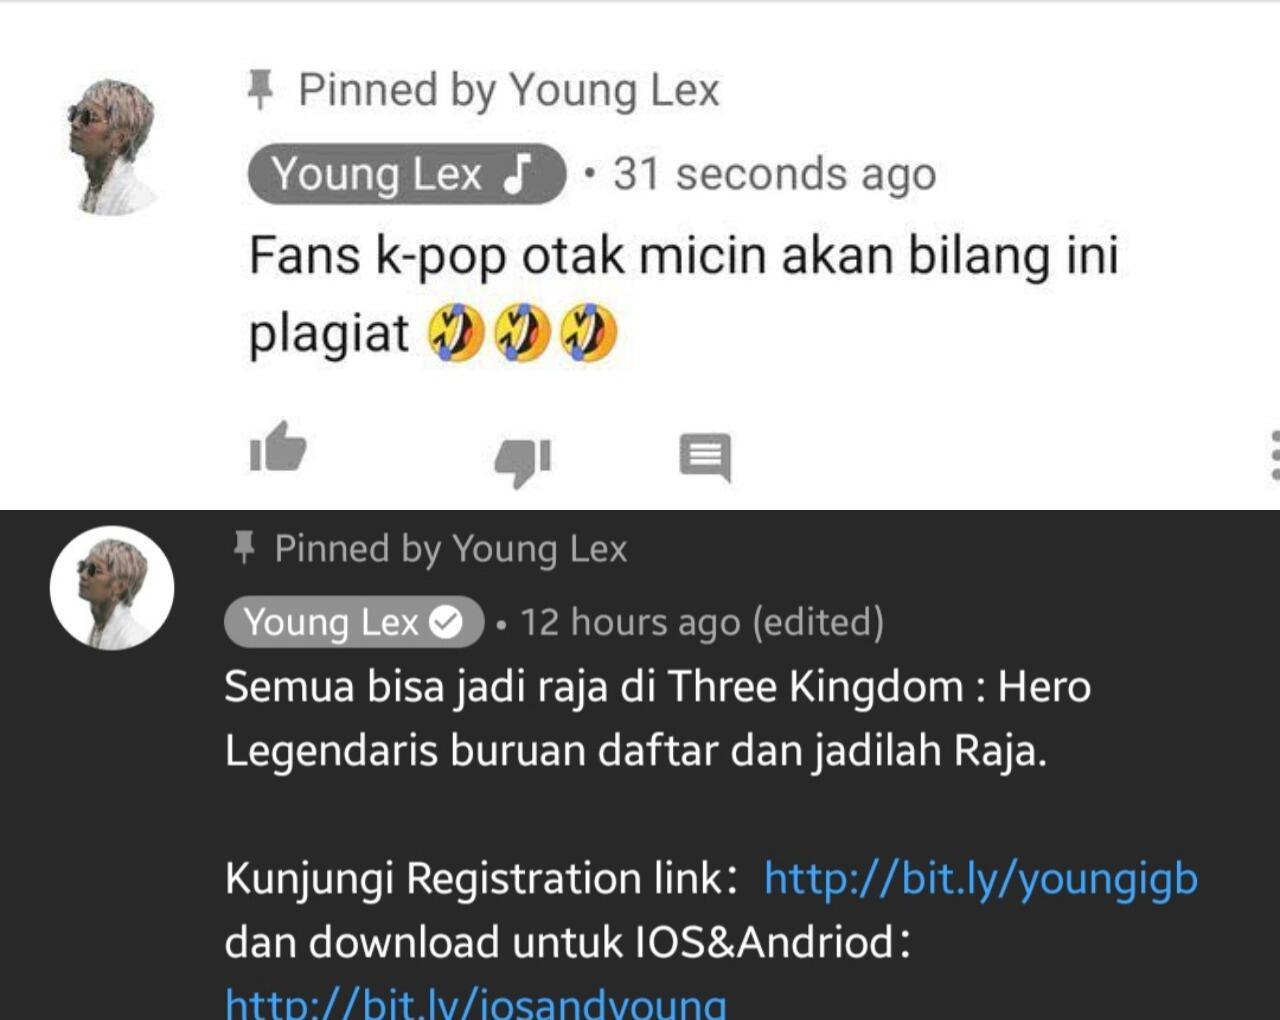 Diduga Plagiat MV Lay 'EXO', Young Lex Dikecam Penggemar EXO